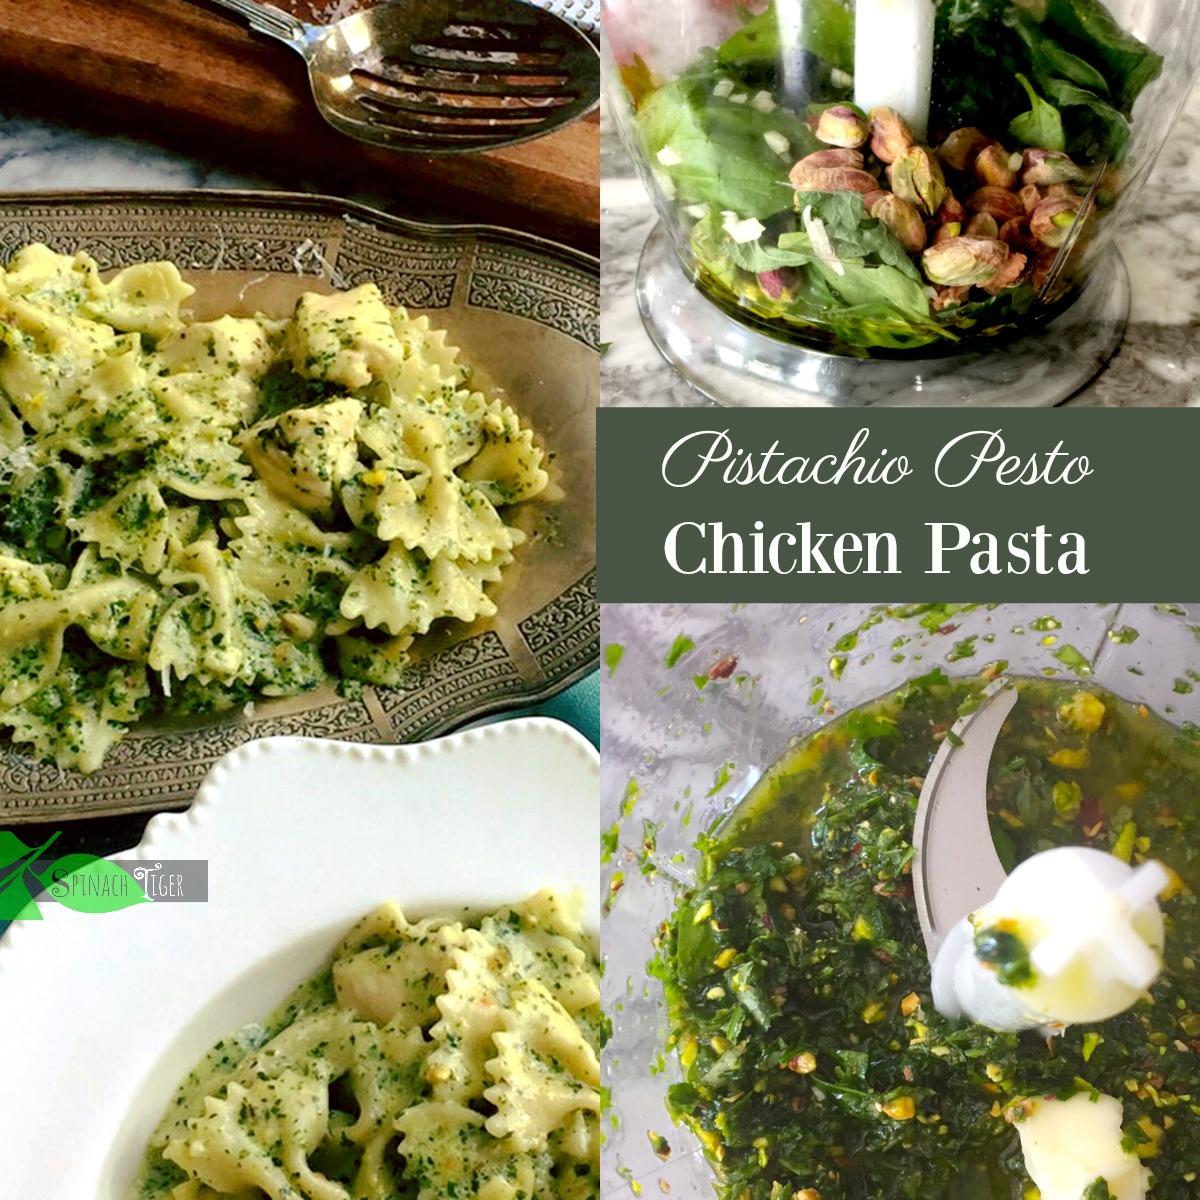 Healthy Chicken Pasta with Creamy Pesto from Spinach Tiger